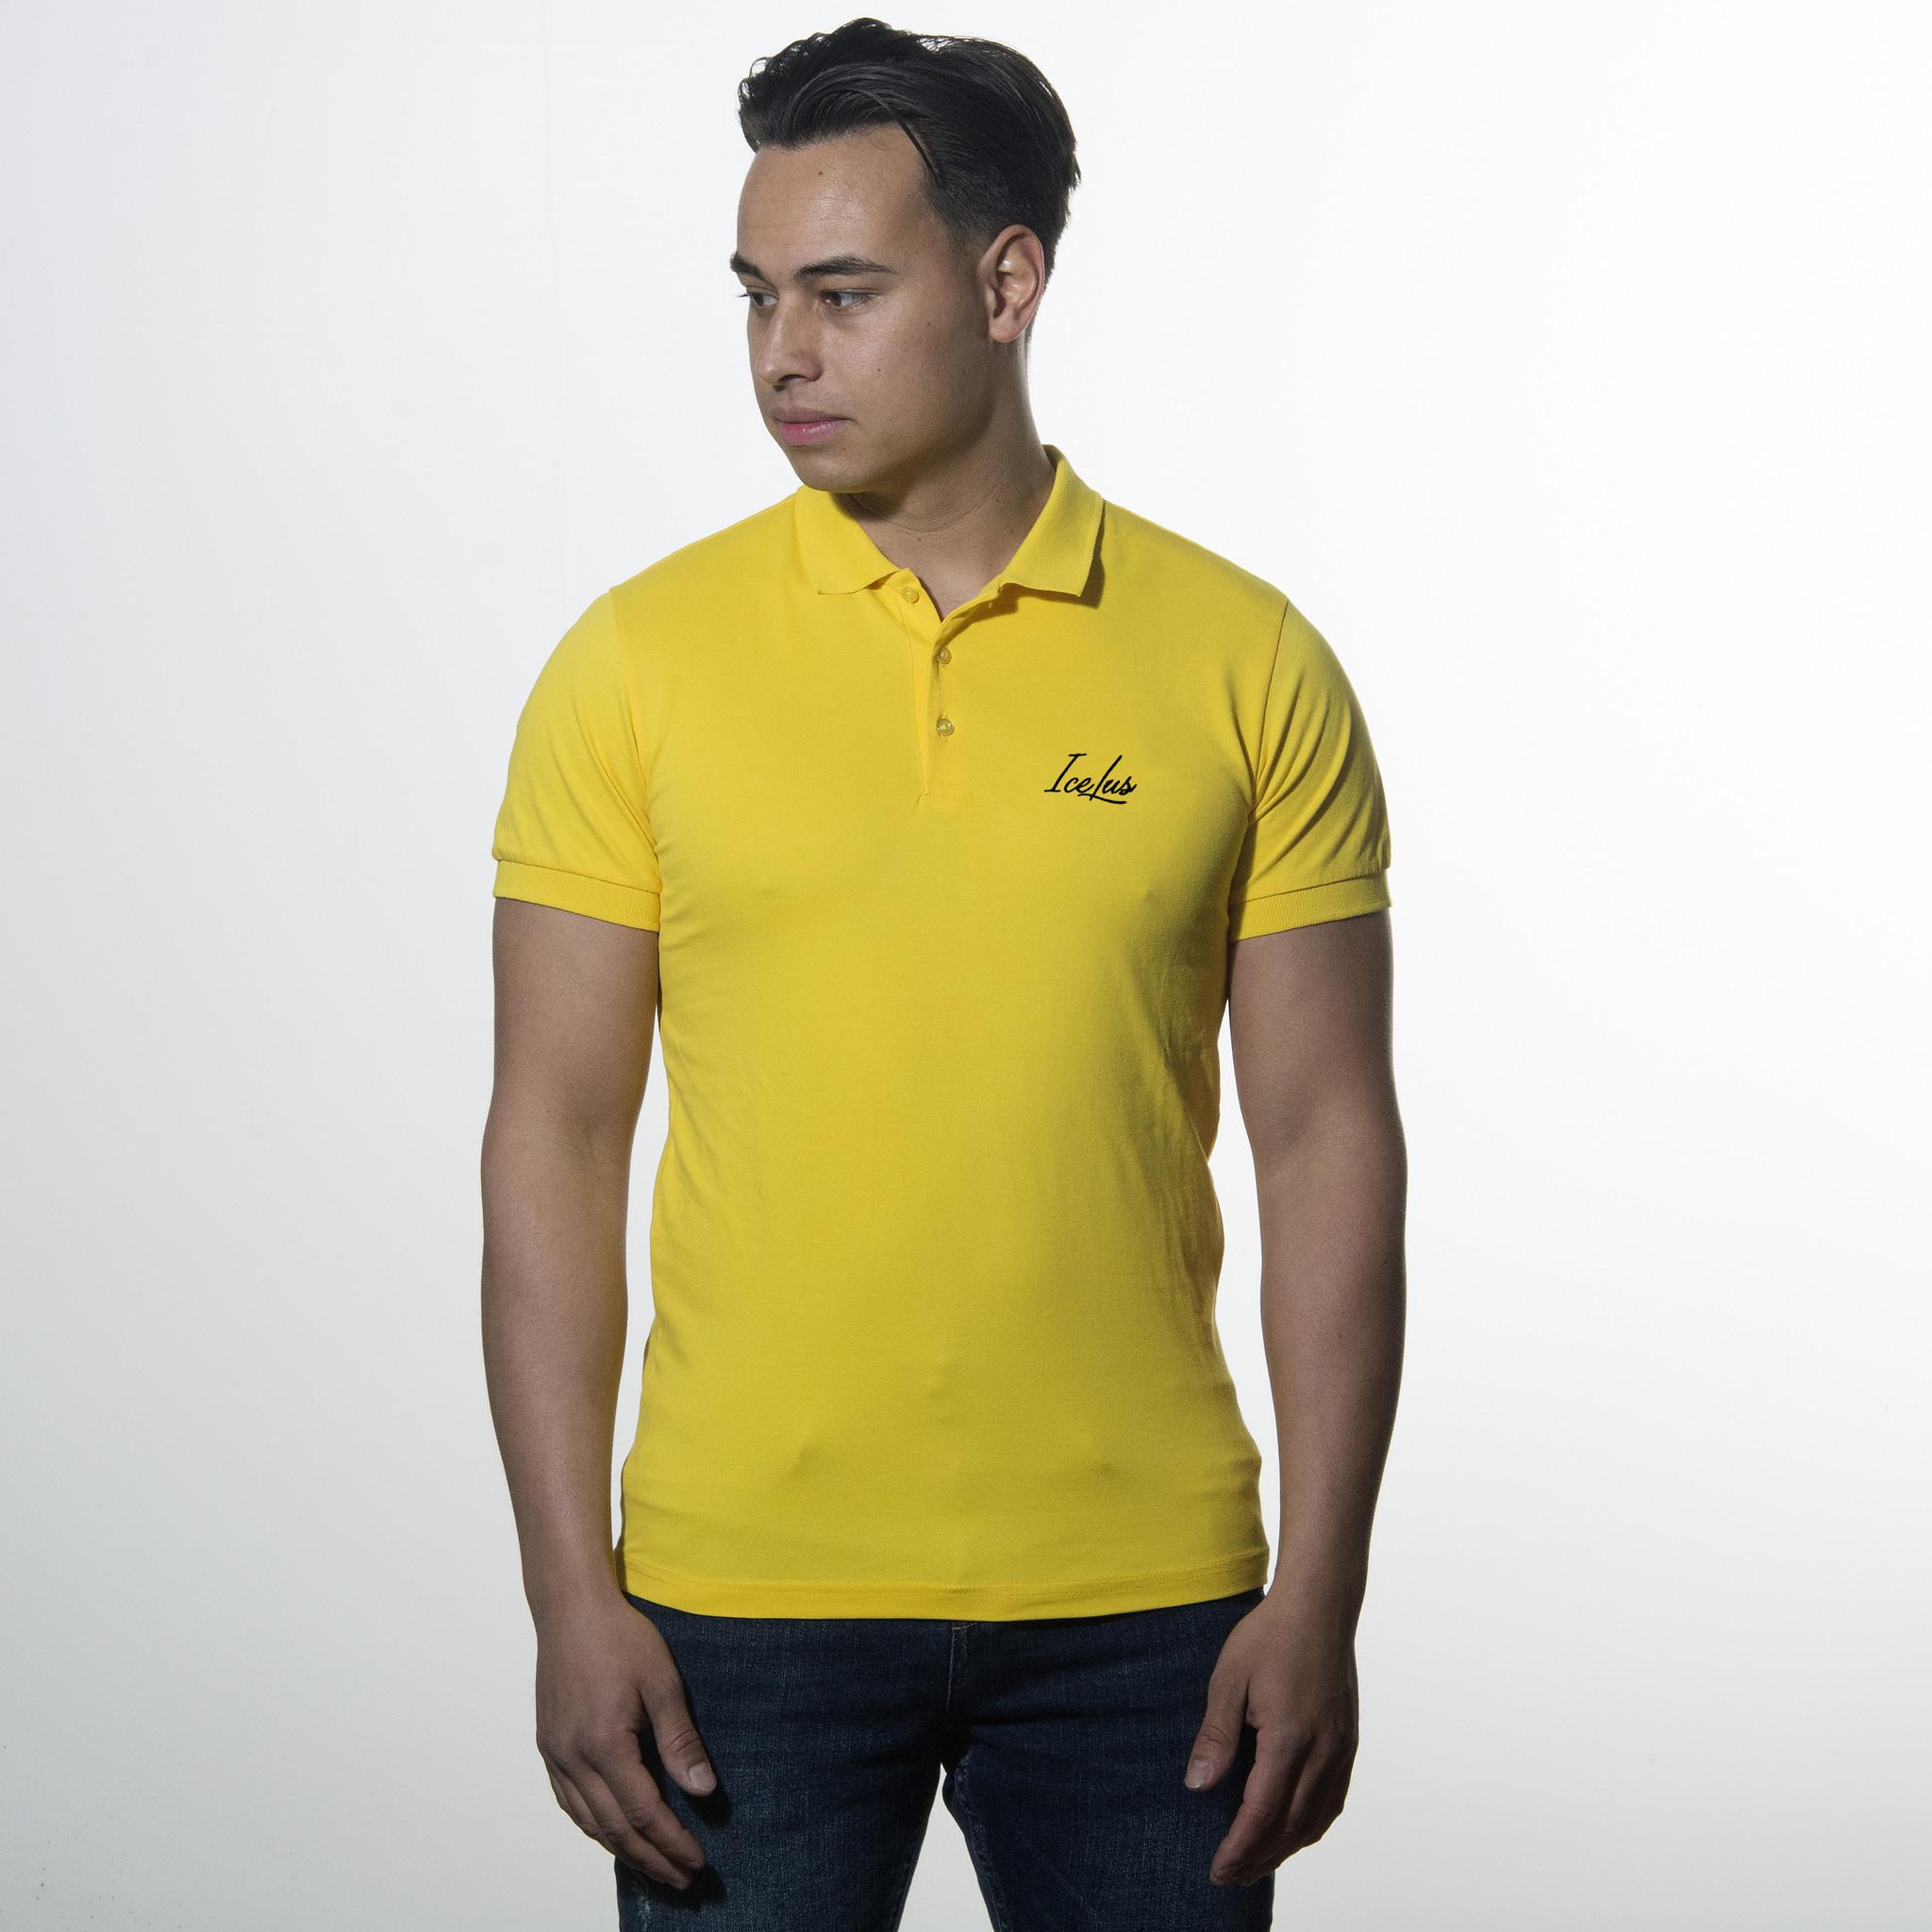 Icelus Clothing Icelus Polo T-shirt Yellow